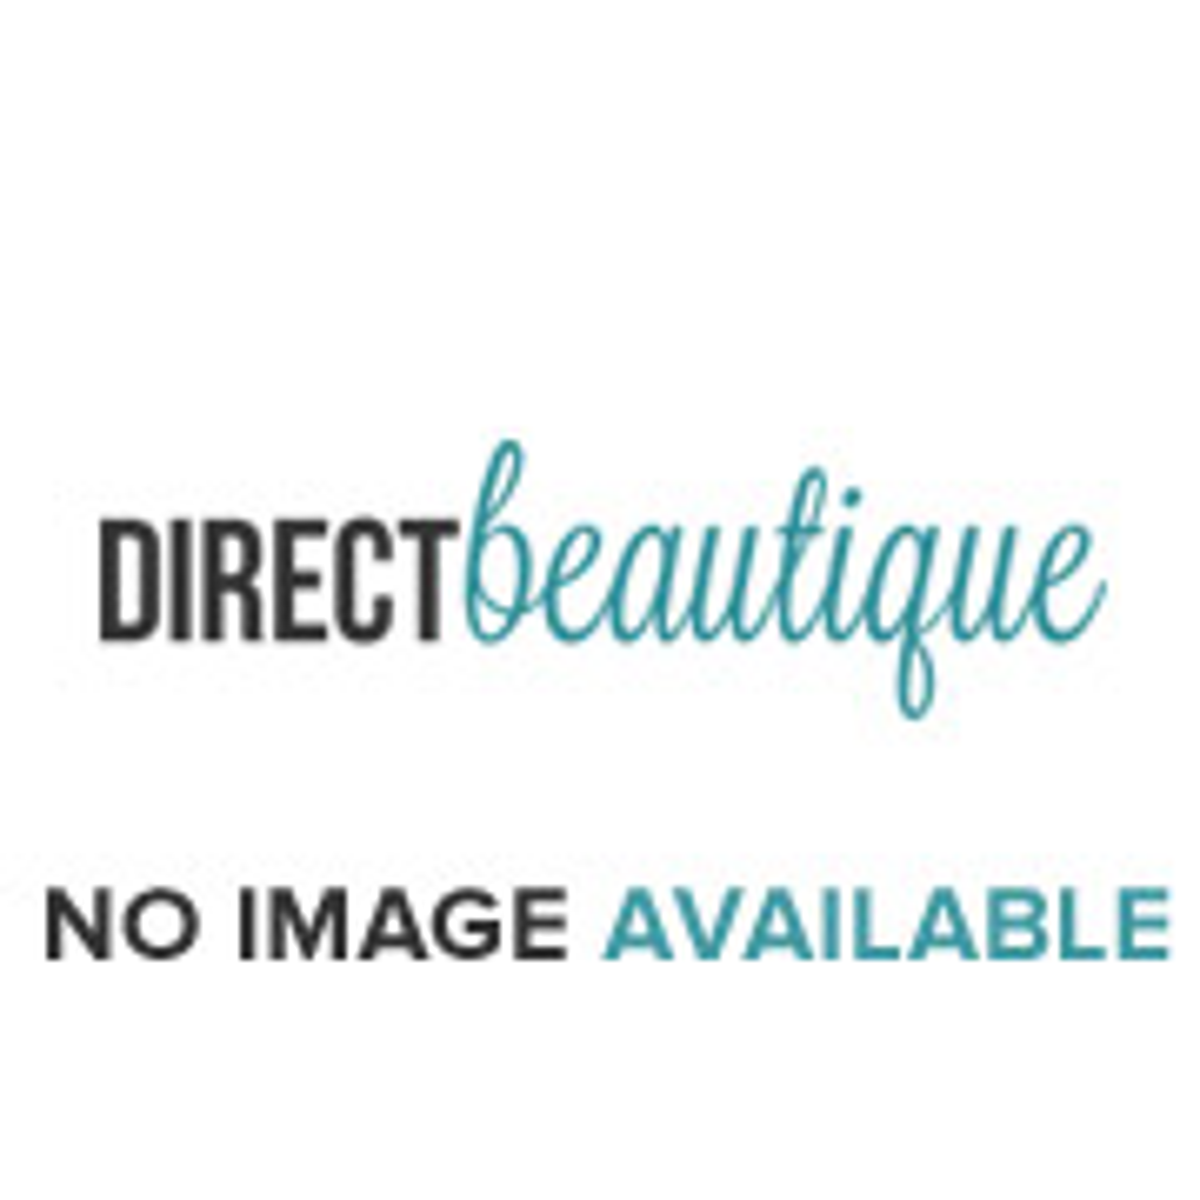 Dolce & Gabbana D&G Pour Femme Intense Gift Set 100ml EDP + 100ml Body Lotion + 100ml Shower Gel - Dolce & Gabbana from Direct Beautique UK